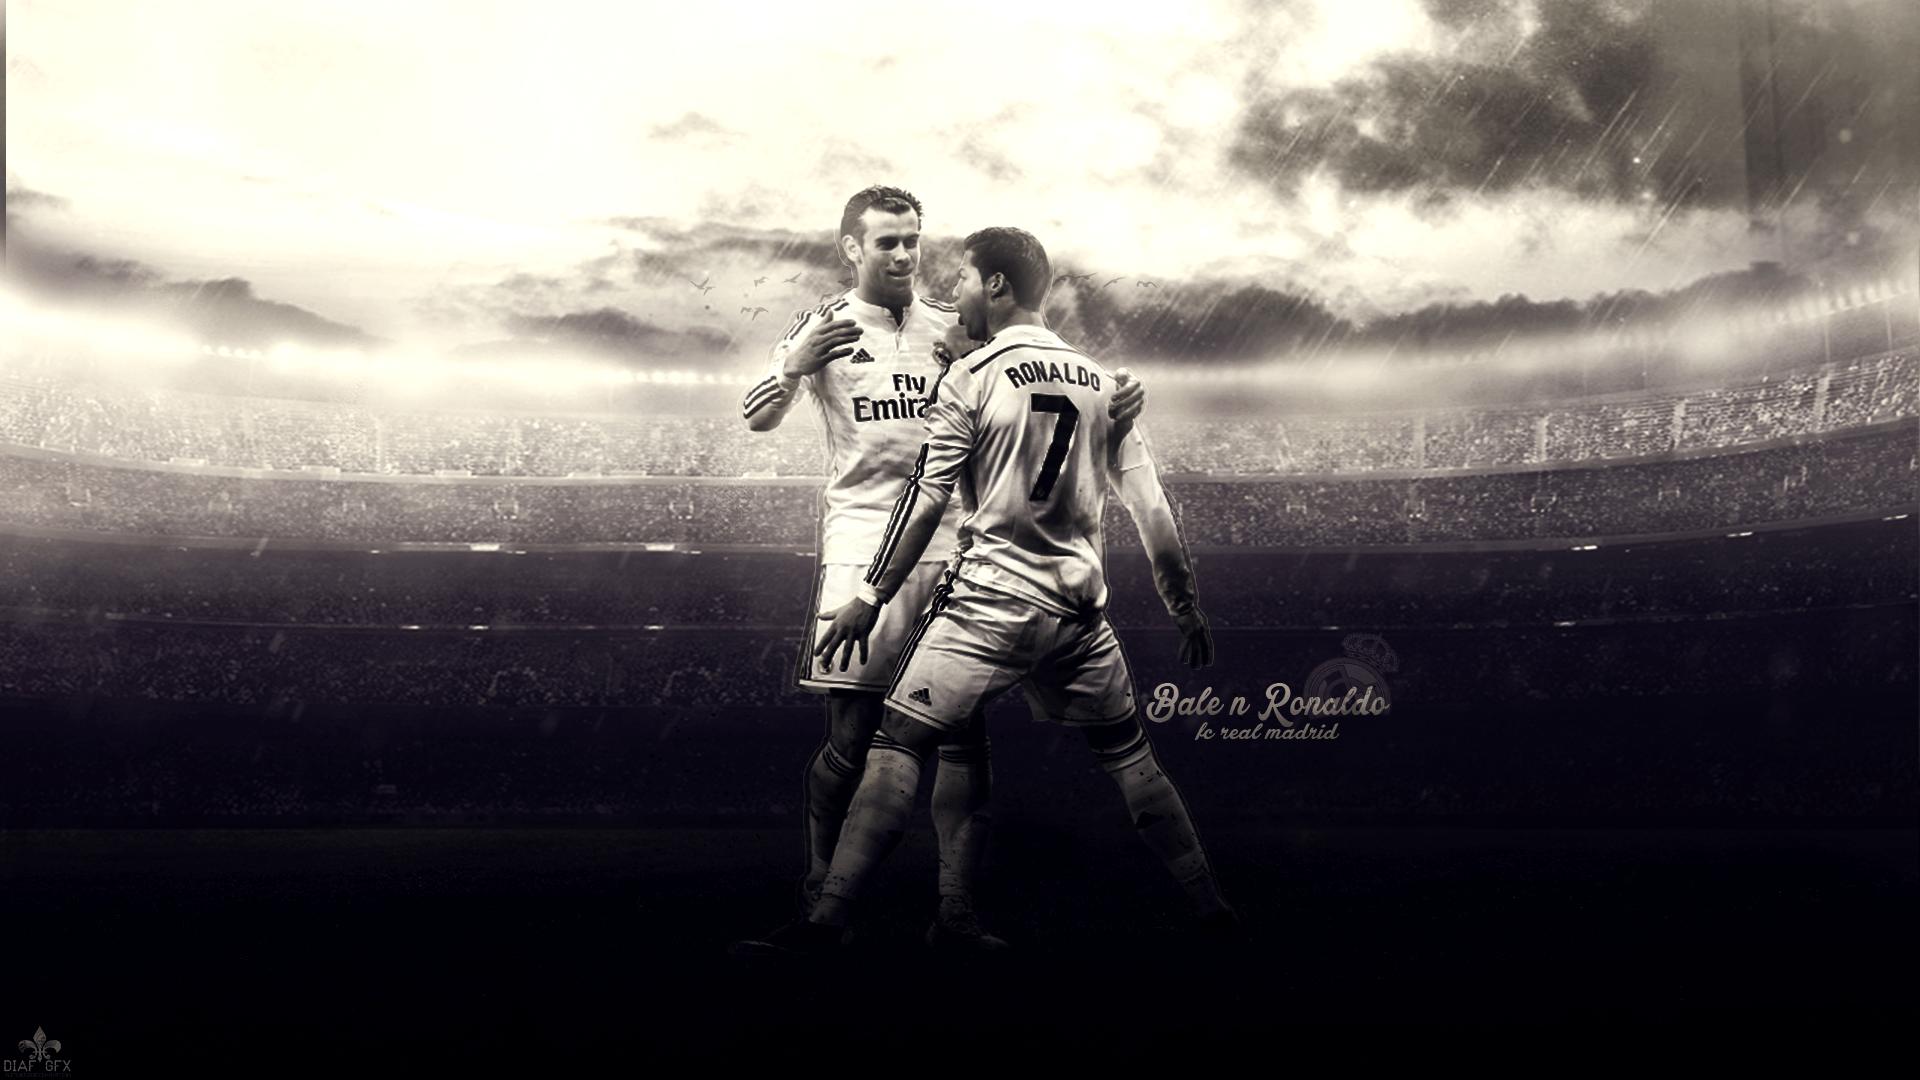 Gareth Bale Wallpaper HD - Soccer Desktop